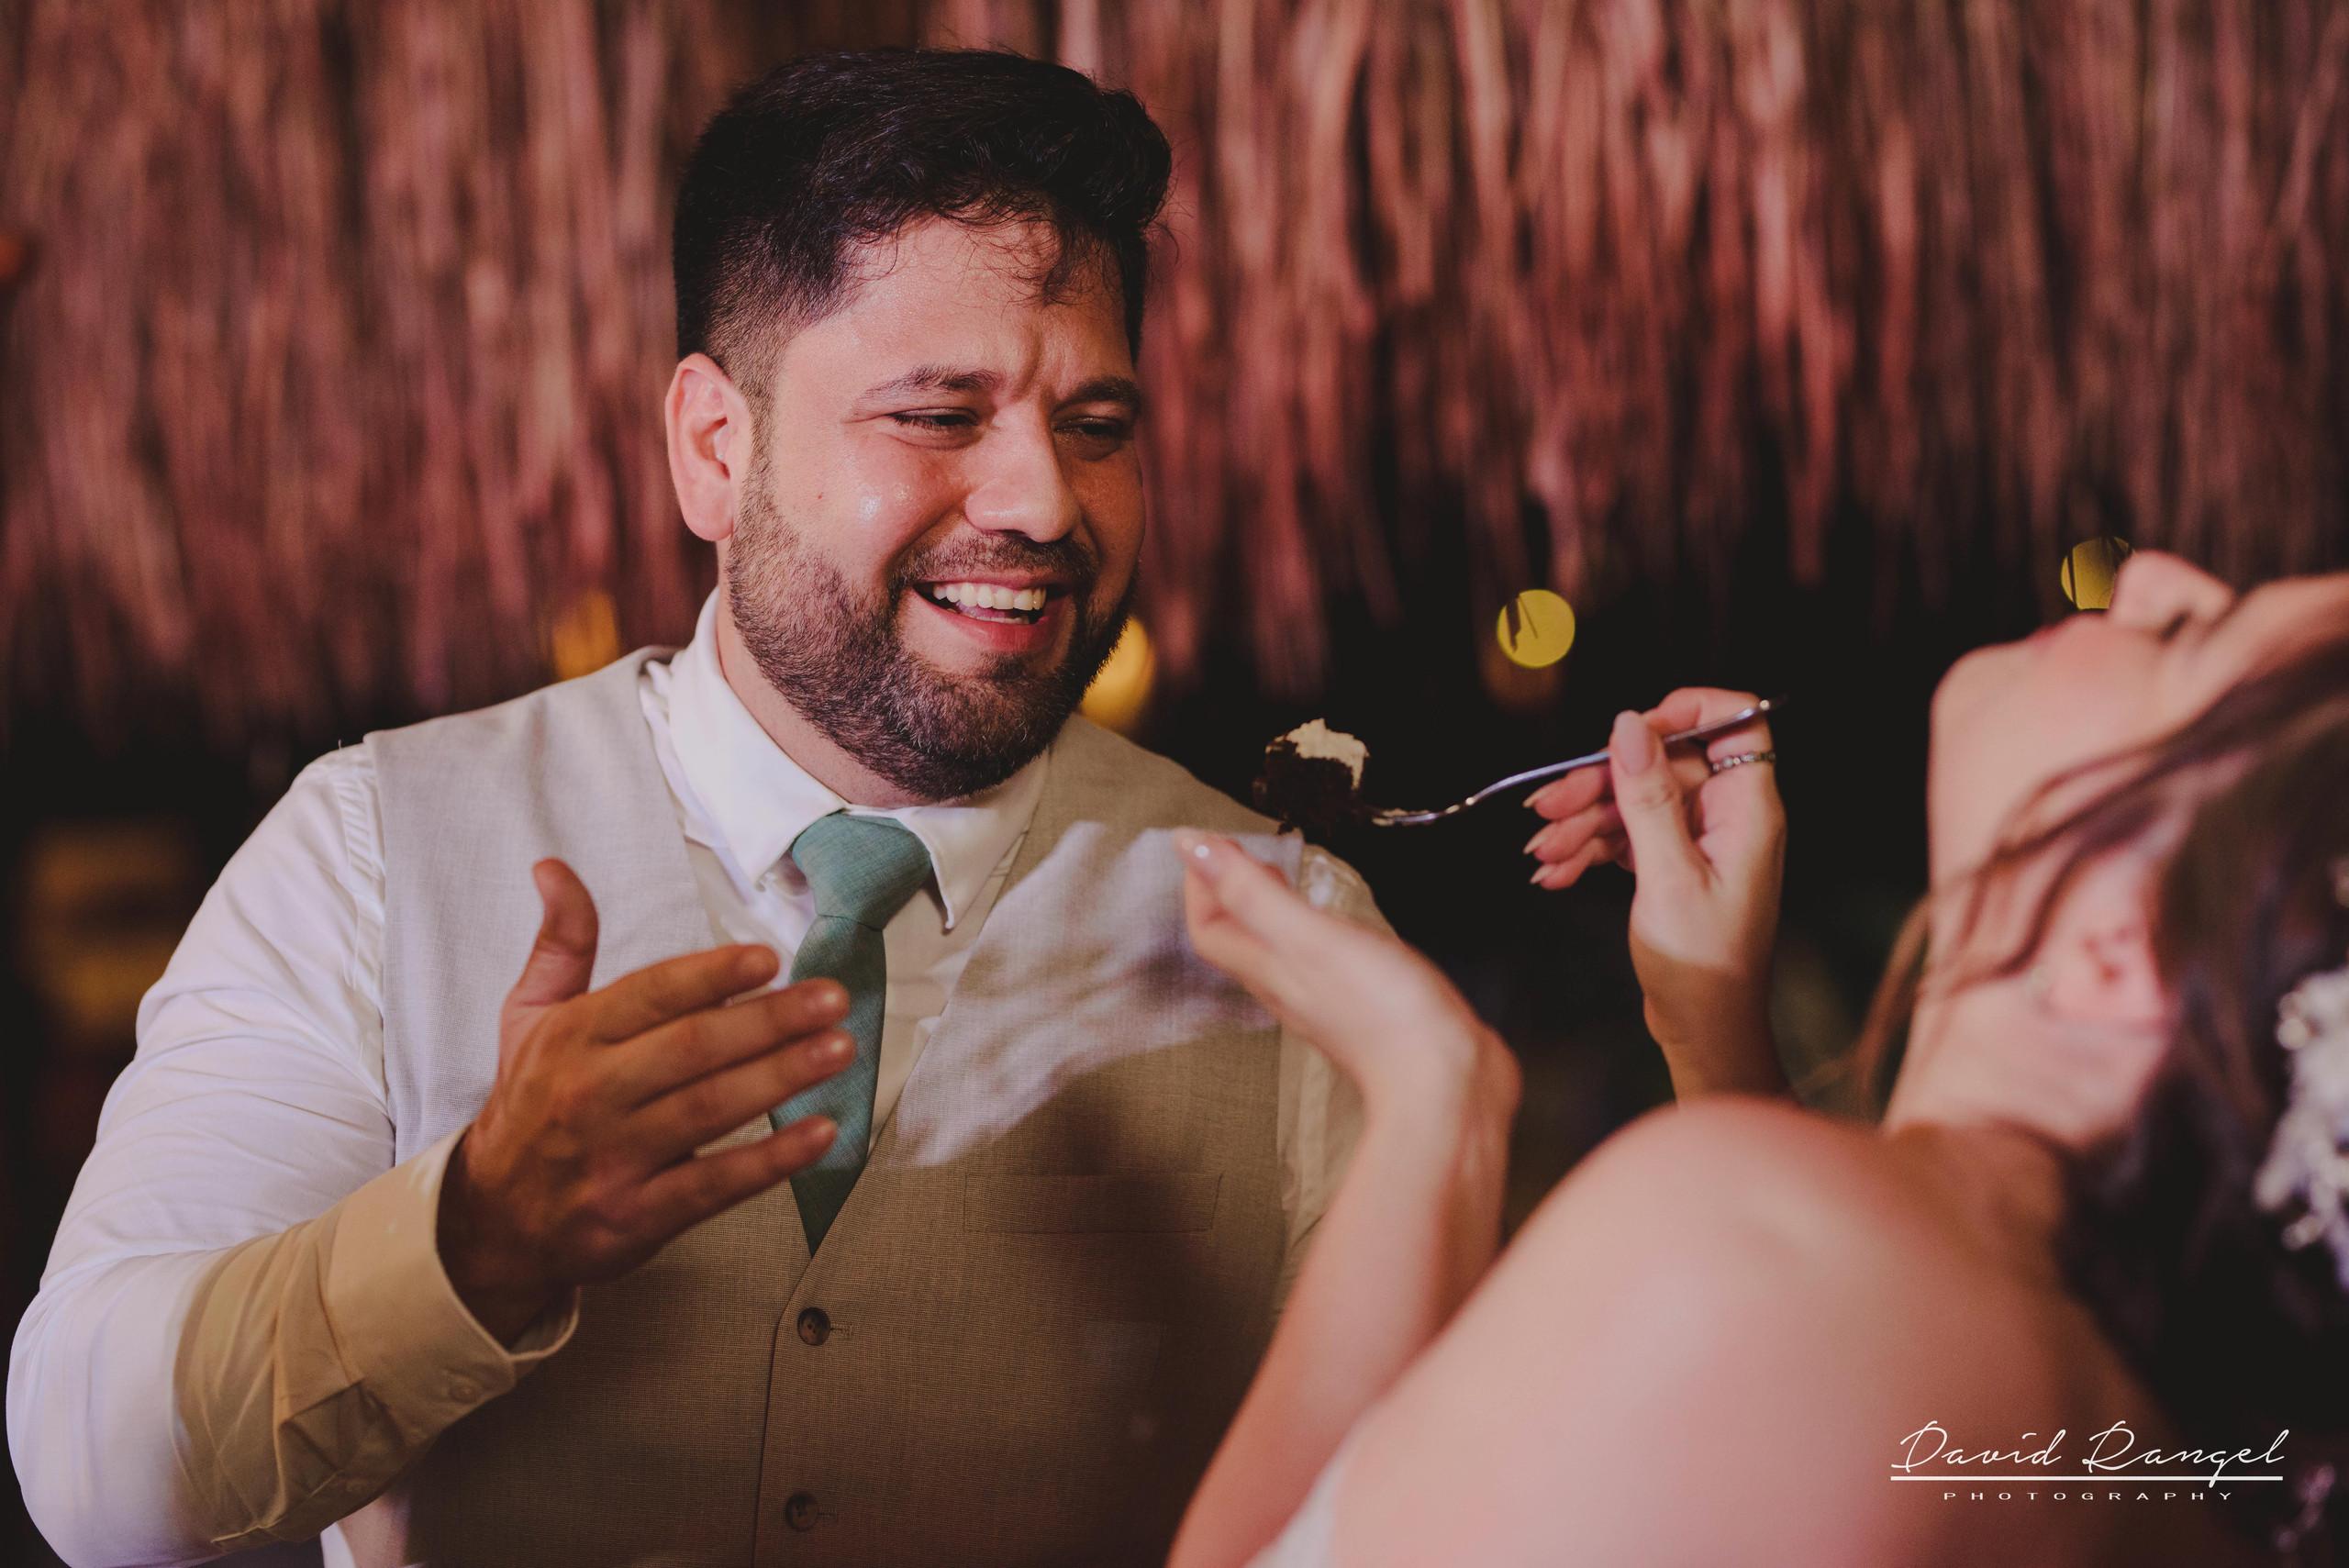 bride+groom+beach+session+happy+love+couple+celebration+wedding+photo+beach+caribean+sea+photographer+david+rangel+dress+suit+villa+chenera+reception+cake+cutting